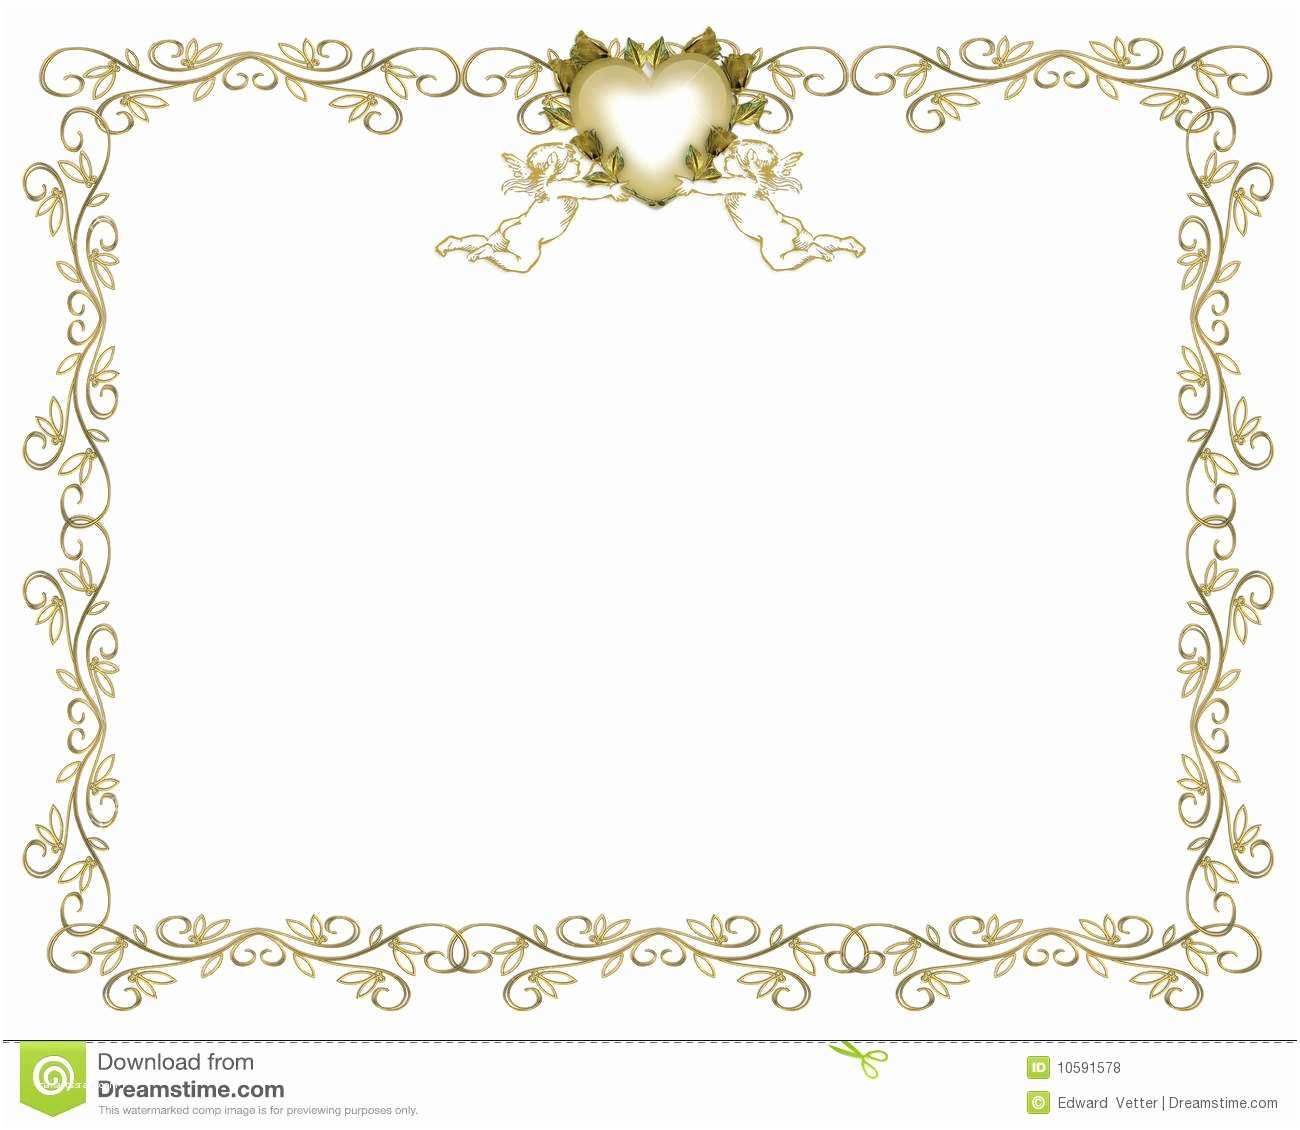 Wedding Invitation Borders Wedding Invitation Gold Border Angels Royalty Free Stock